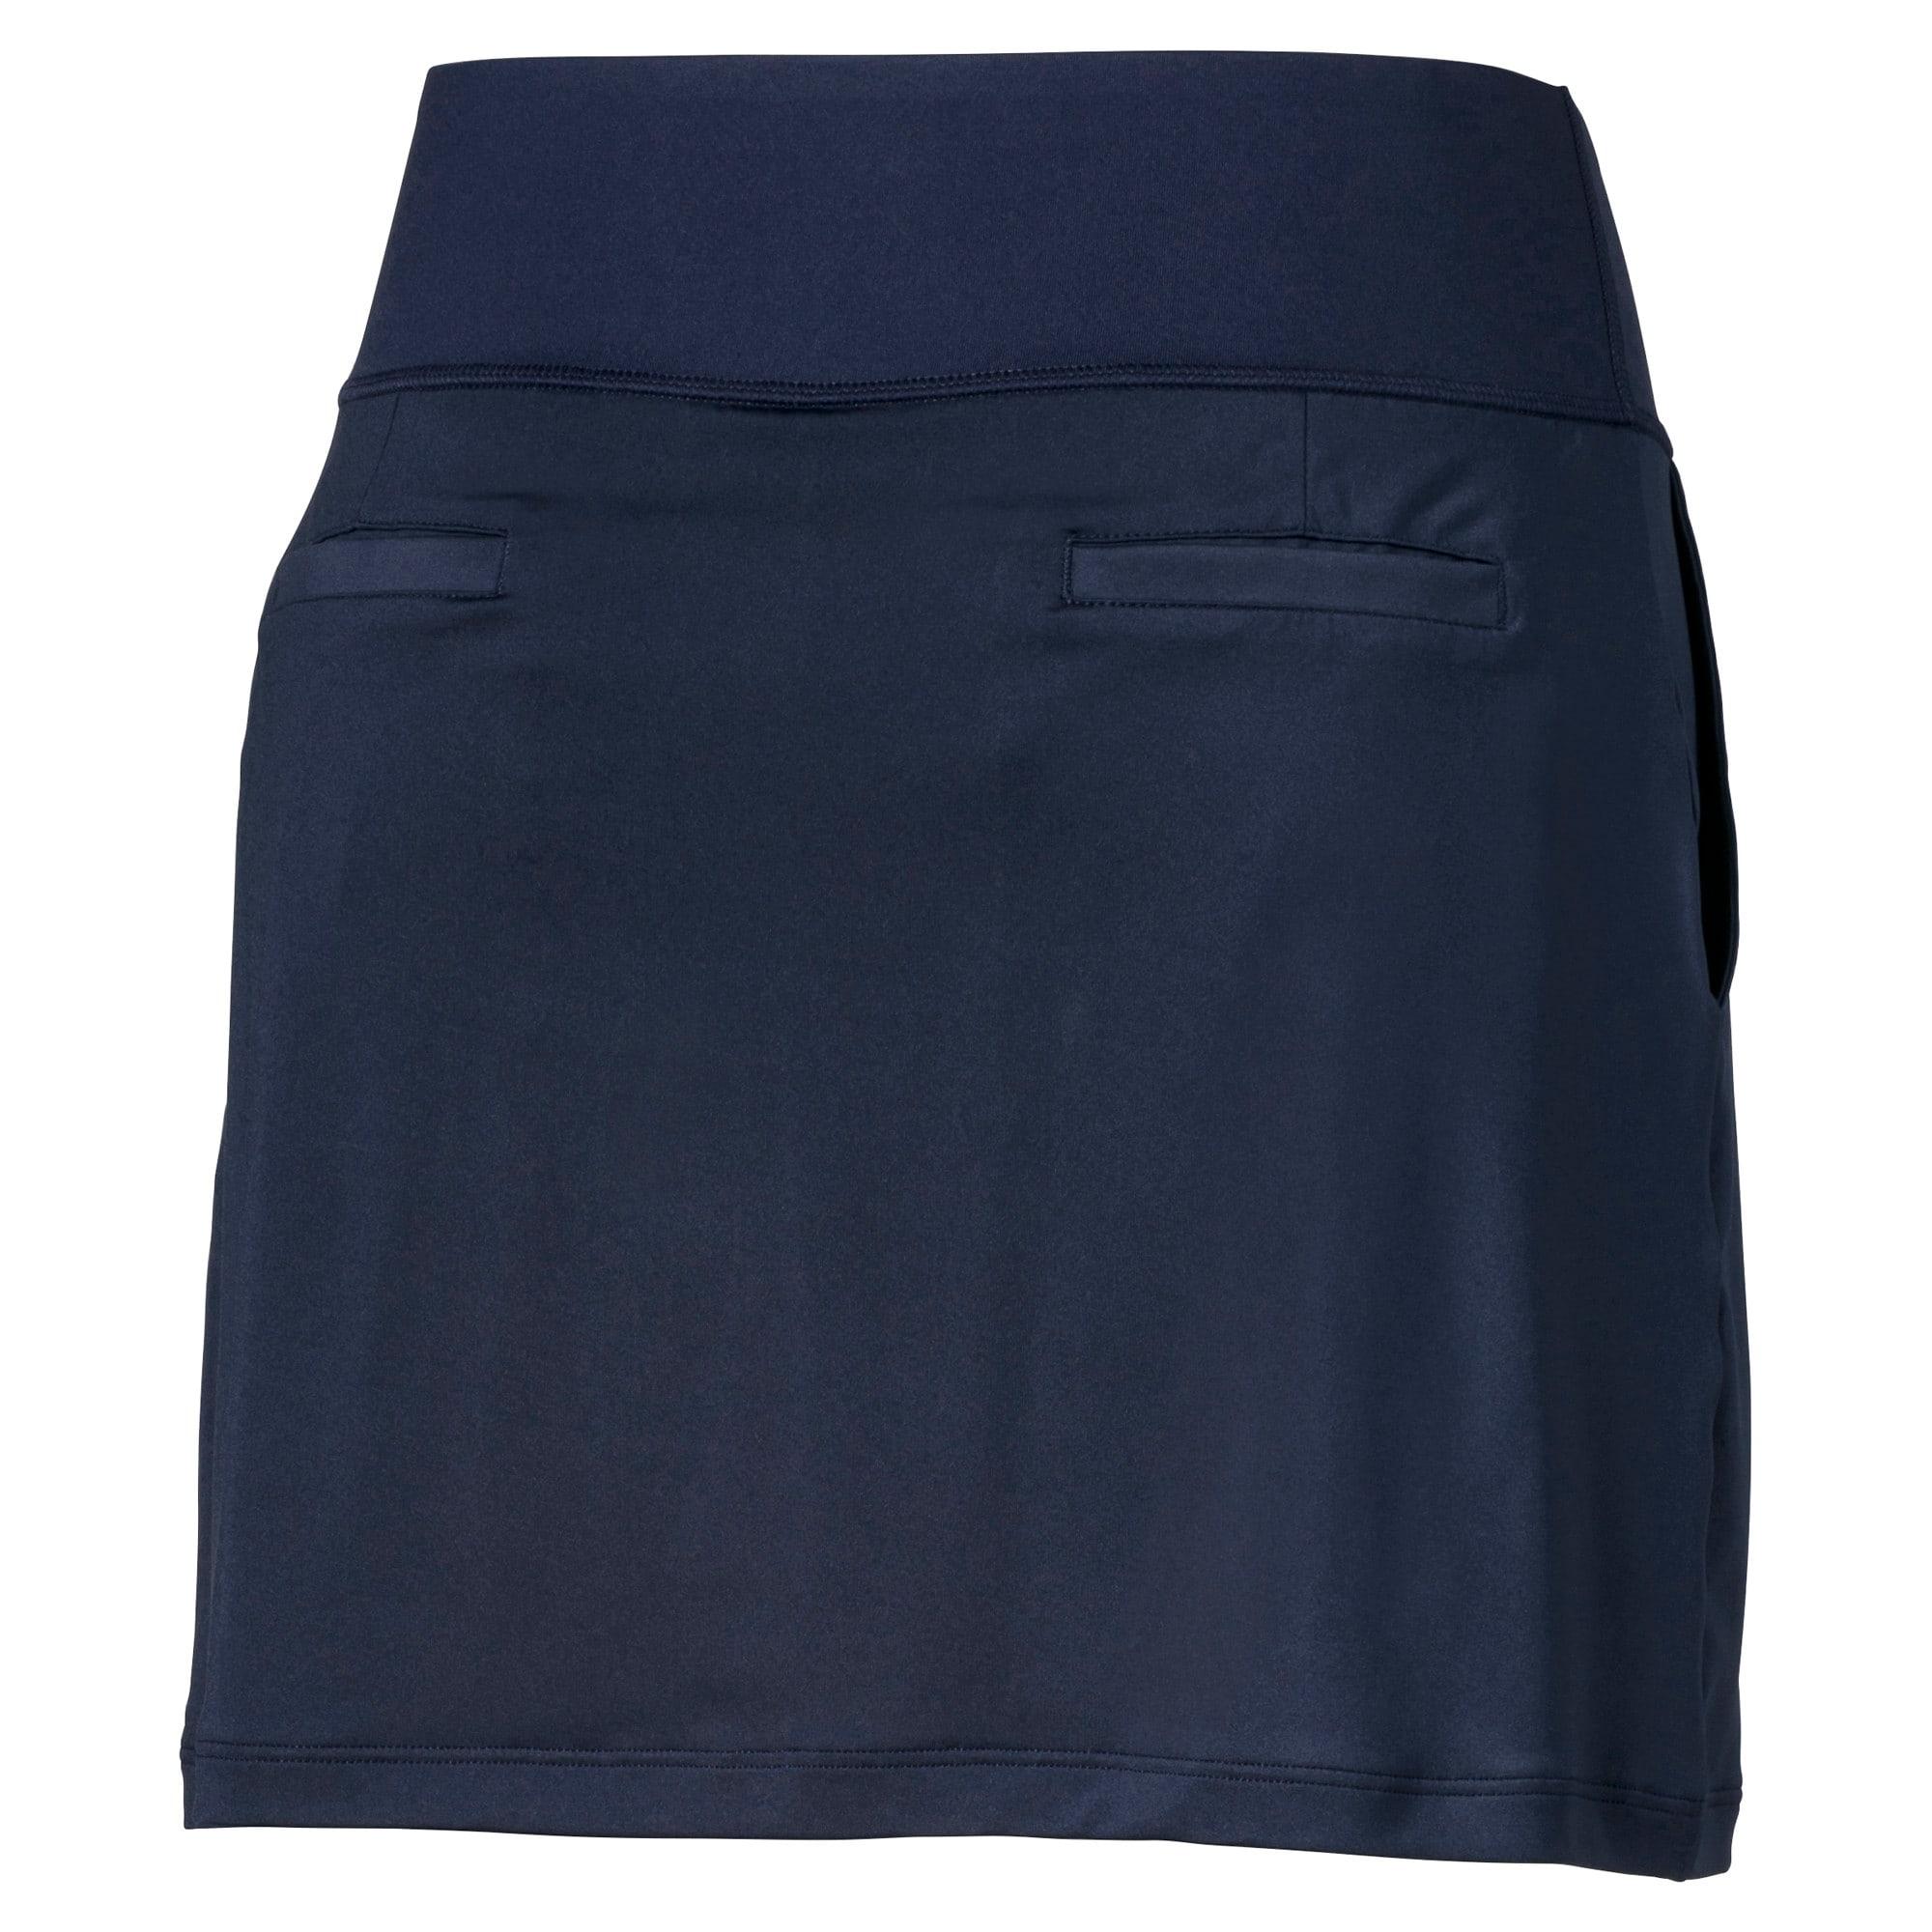 Thumbnail 2 of Golf Women's PWRSHAPE Solid Knit Skirt, Peacoat, medium